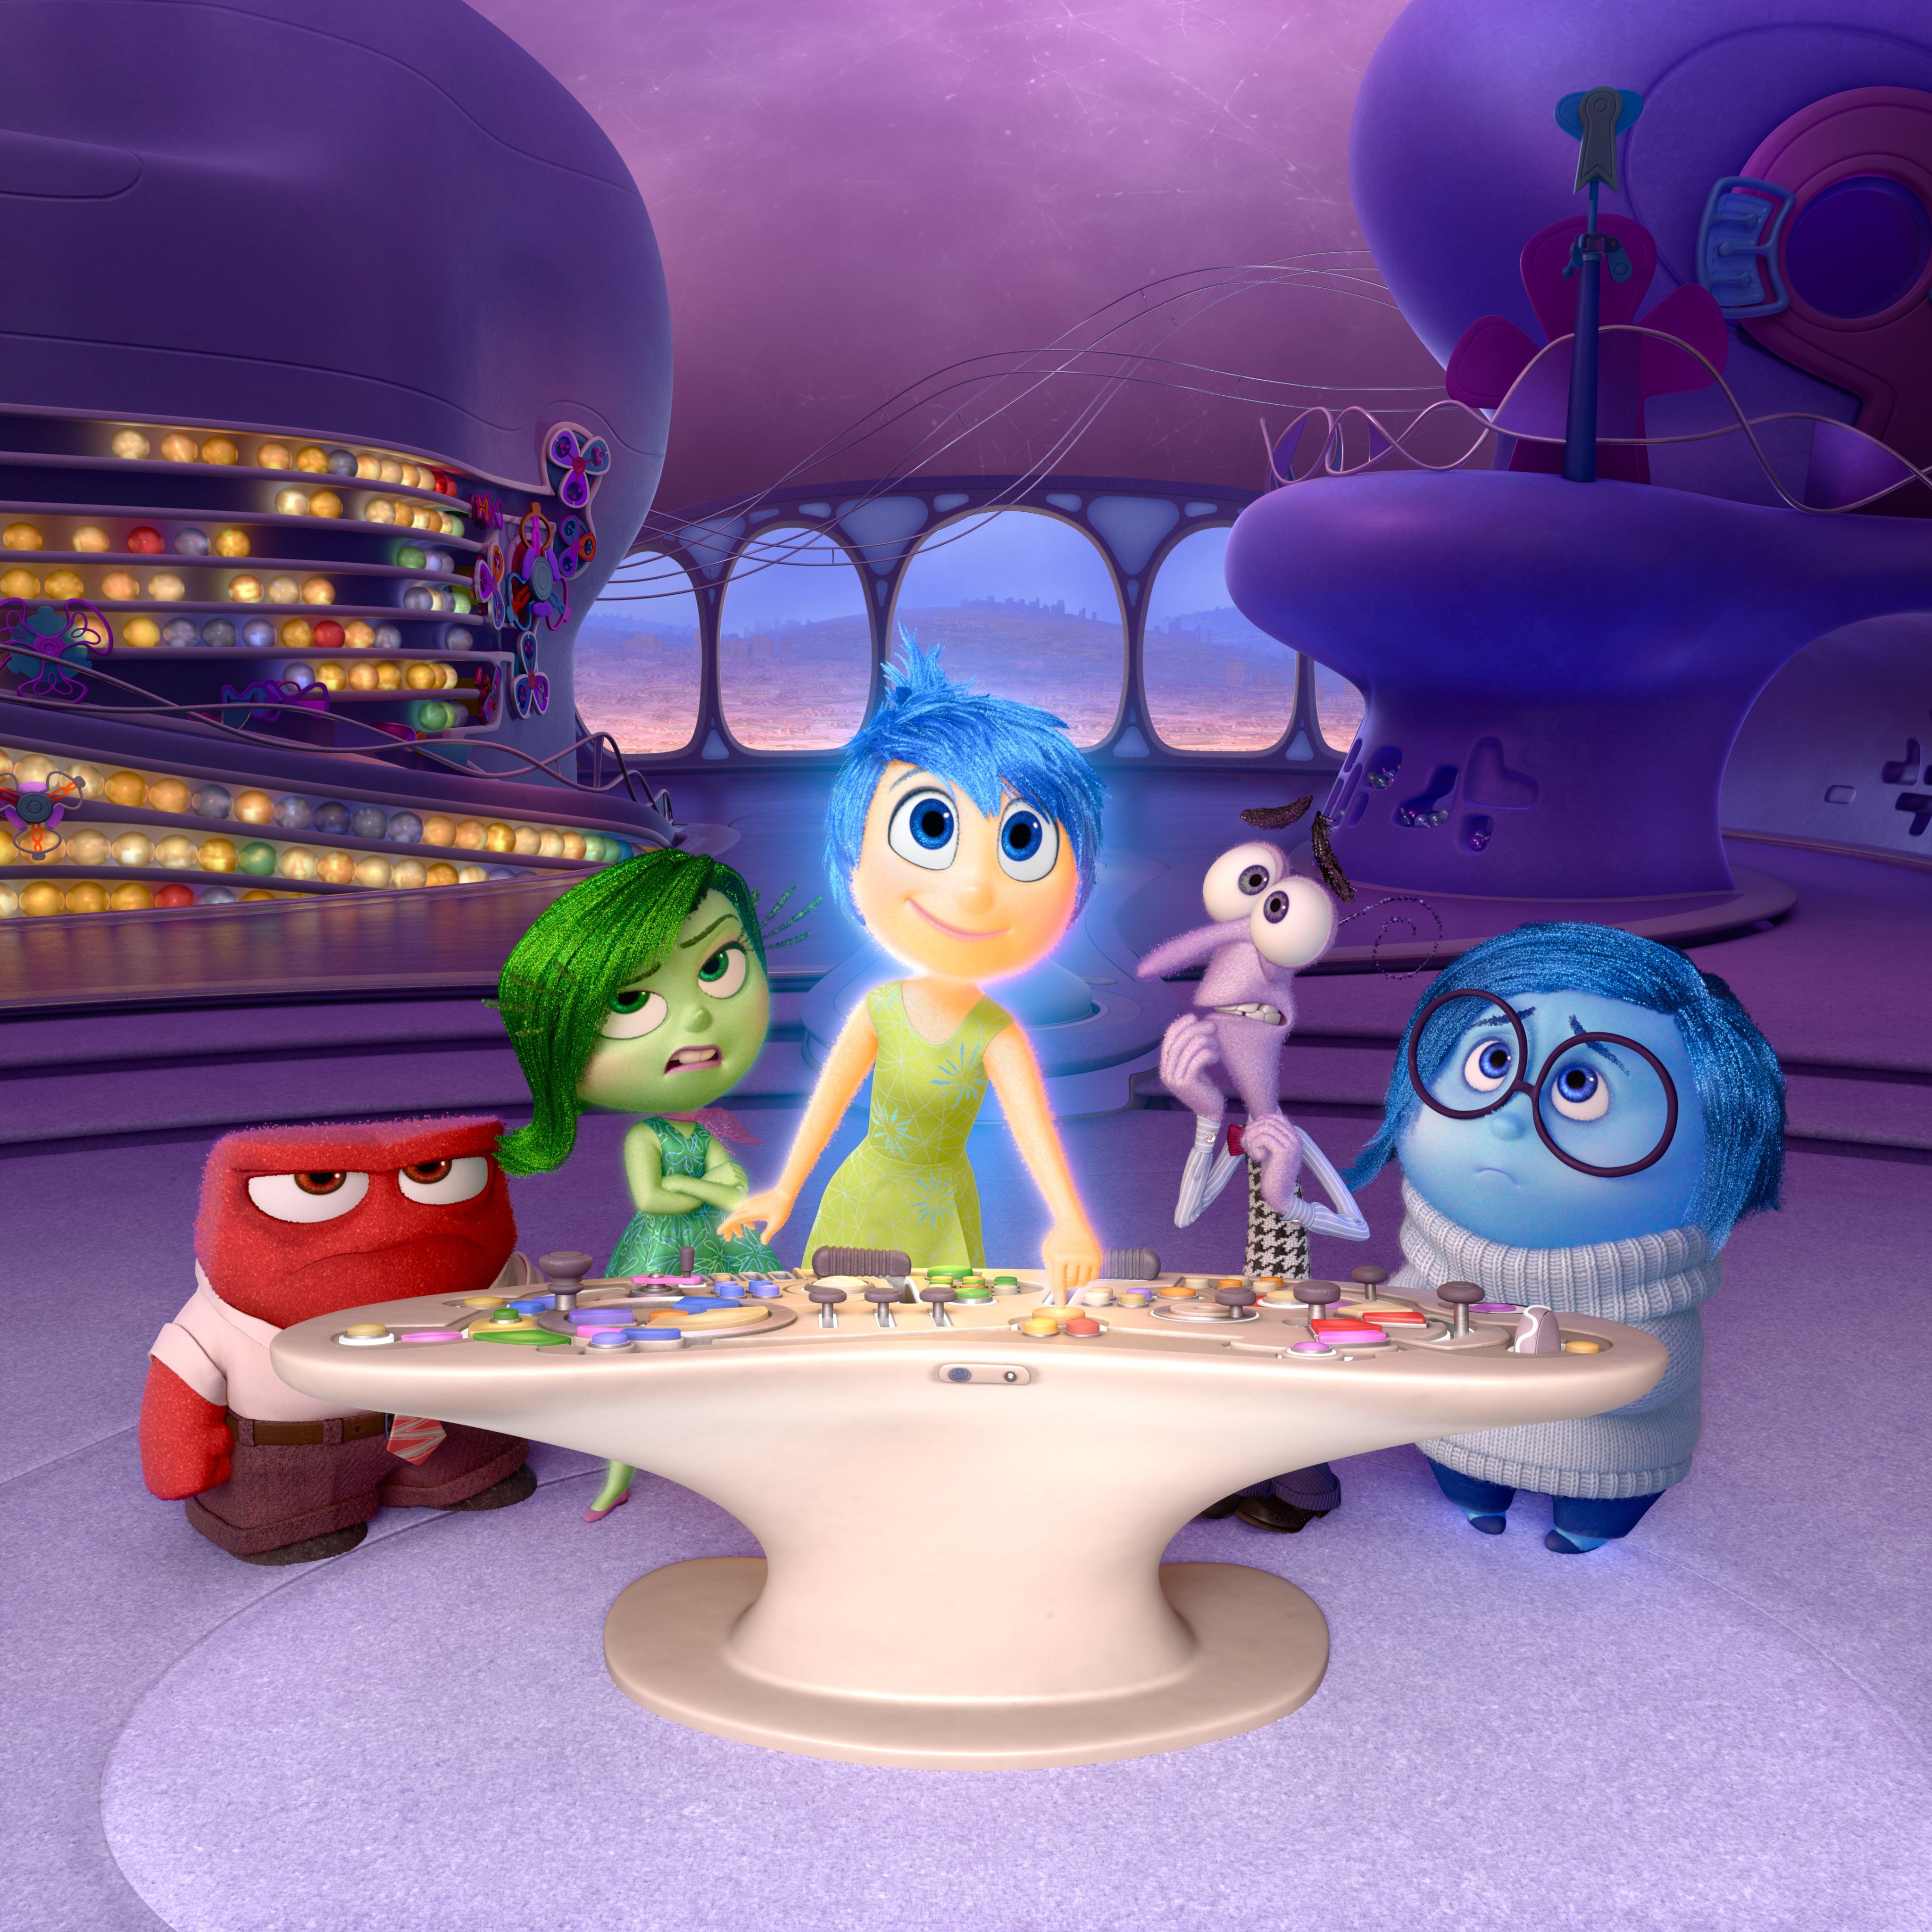 Disney Pixar Inside Out Movie Review #DisneyPixar #InsideOut #Disney #pixar